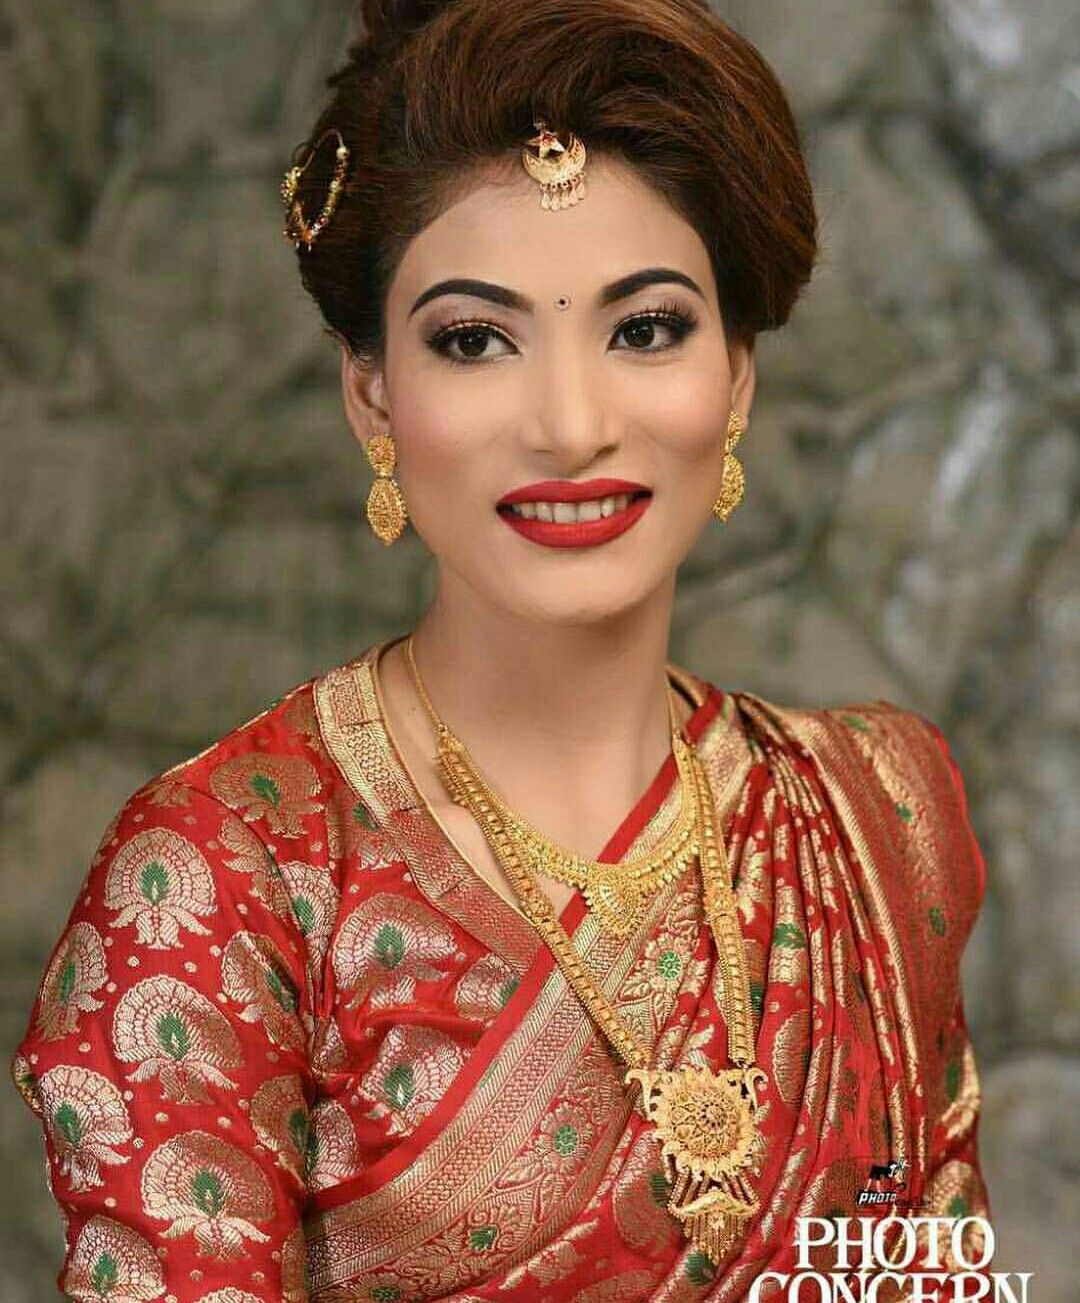 Nepali Wedding Tradition Nepal Marriage Bride Makeup Simple Saree Dress Bridal Wear Bridal Outfits Bridal Looks